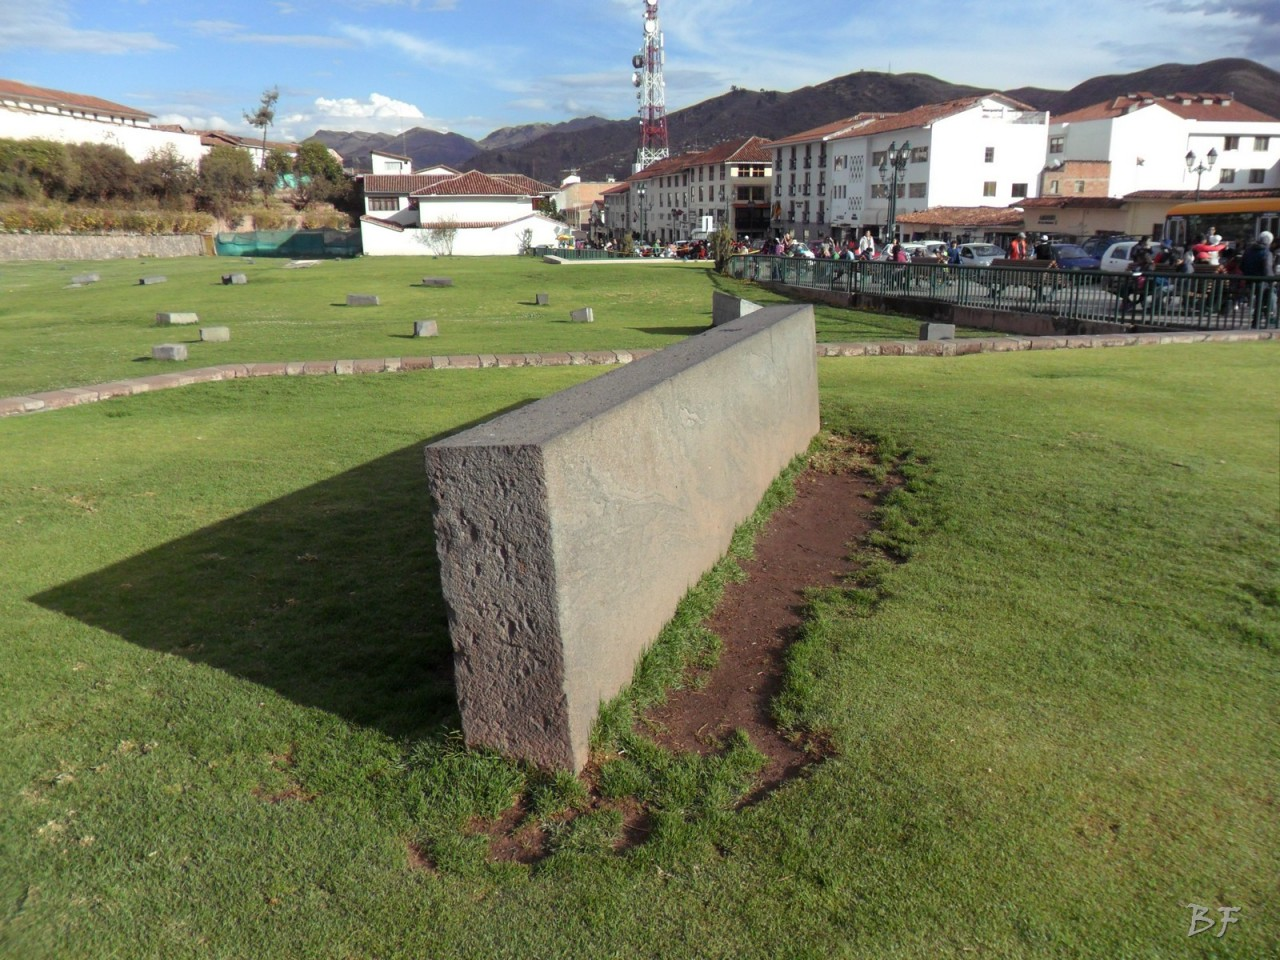 Mura-Poligonali-Megaliti-Tempio-Coricancha-Cusco-Perù-18